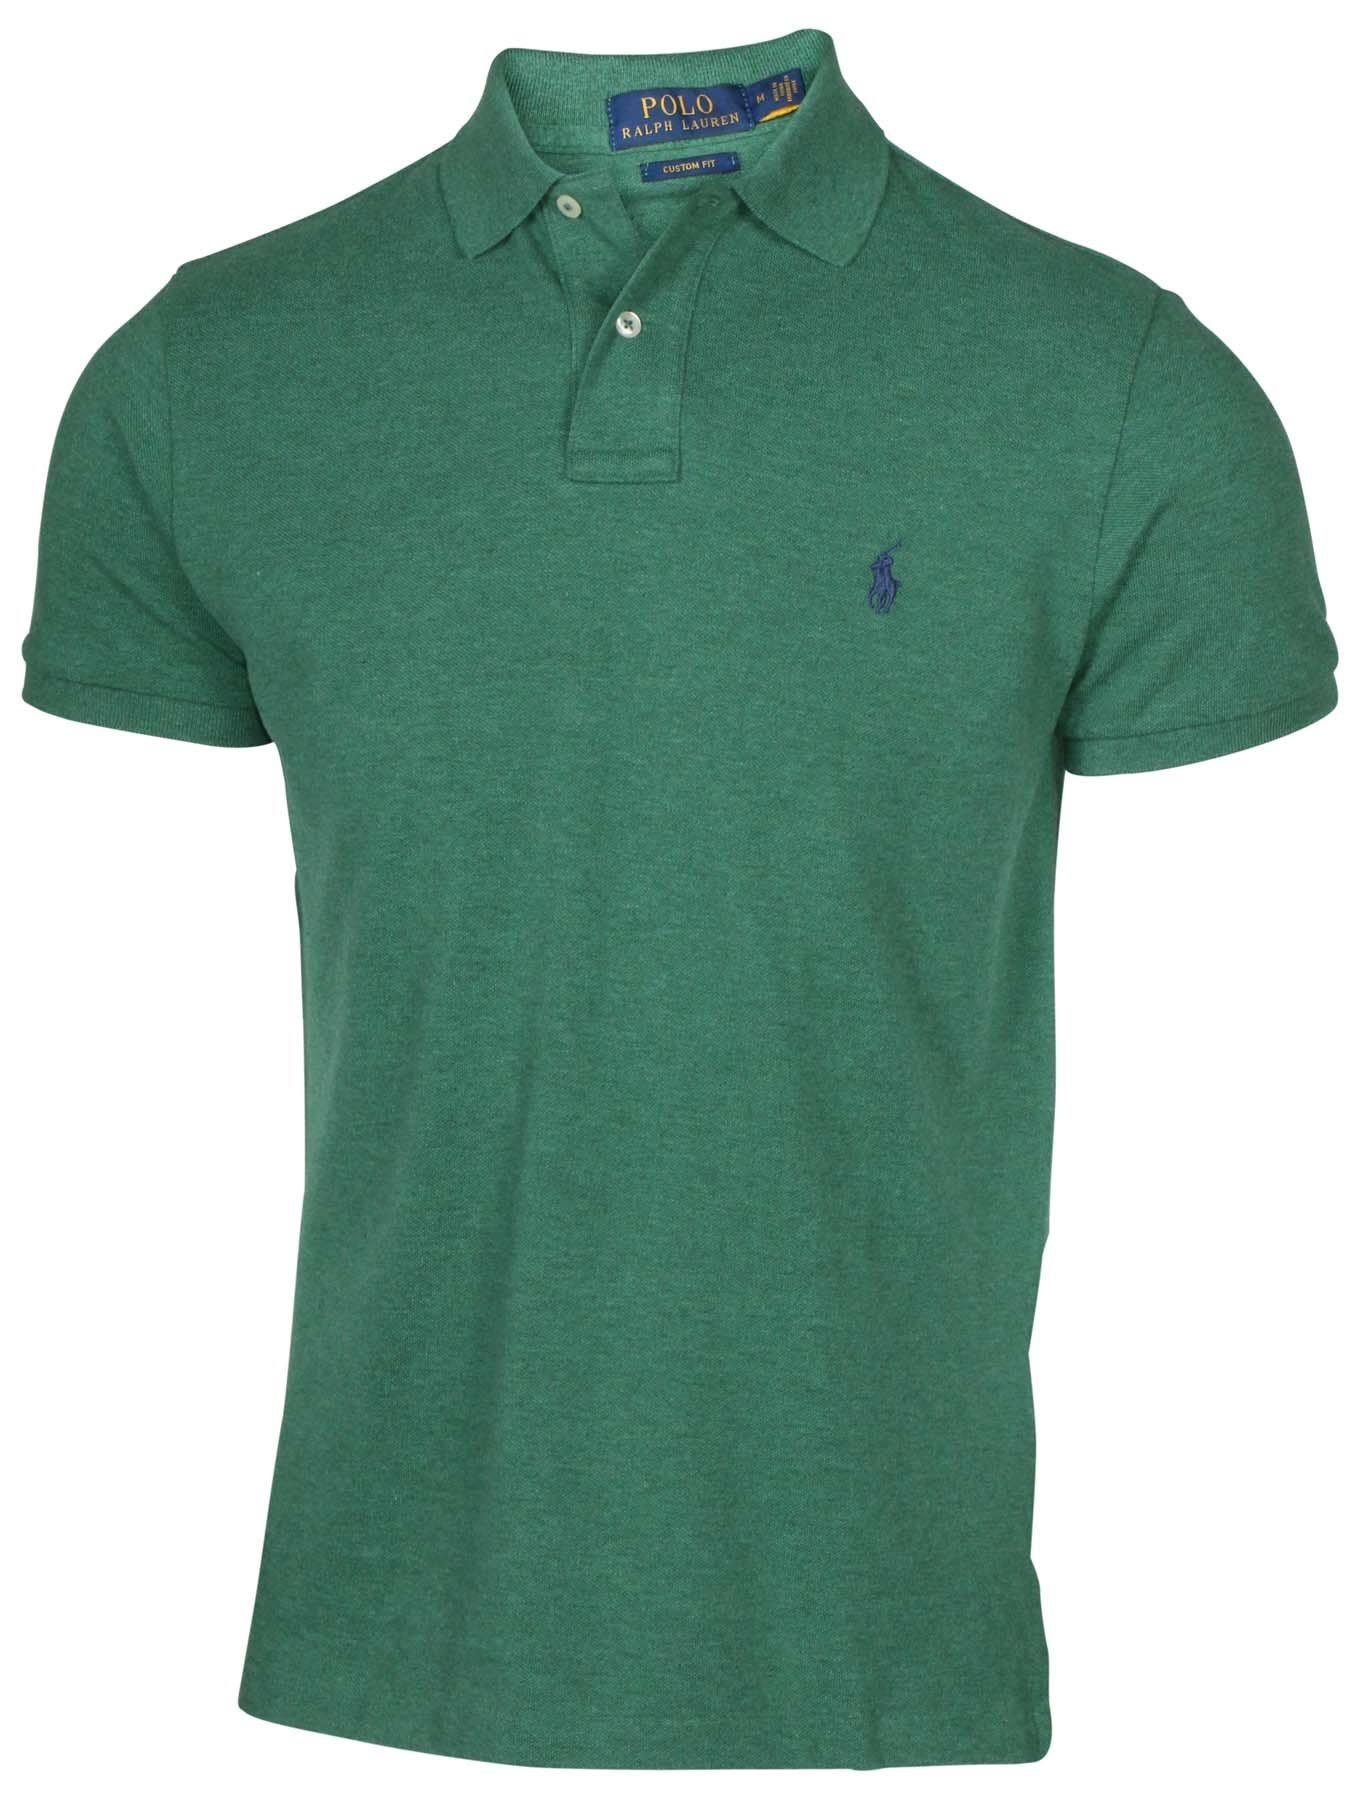 De Personalizado Polo Tamaño Ajuste Lauren Con Para Verde Pony Xxl Hombre Ralph Camiseta xSqSt01a